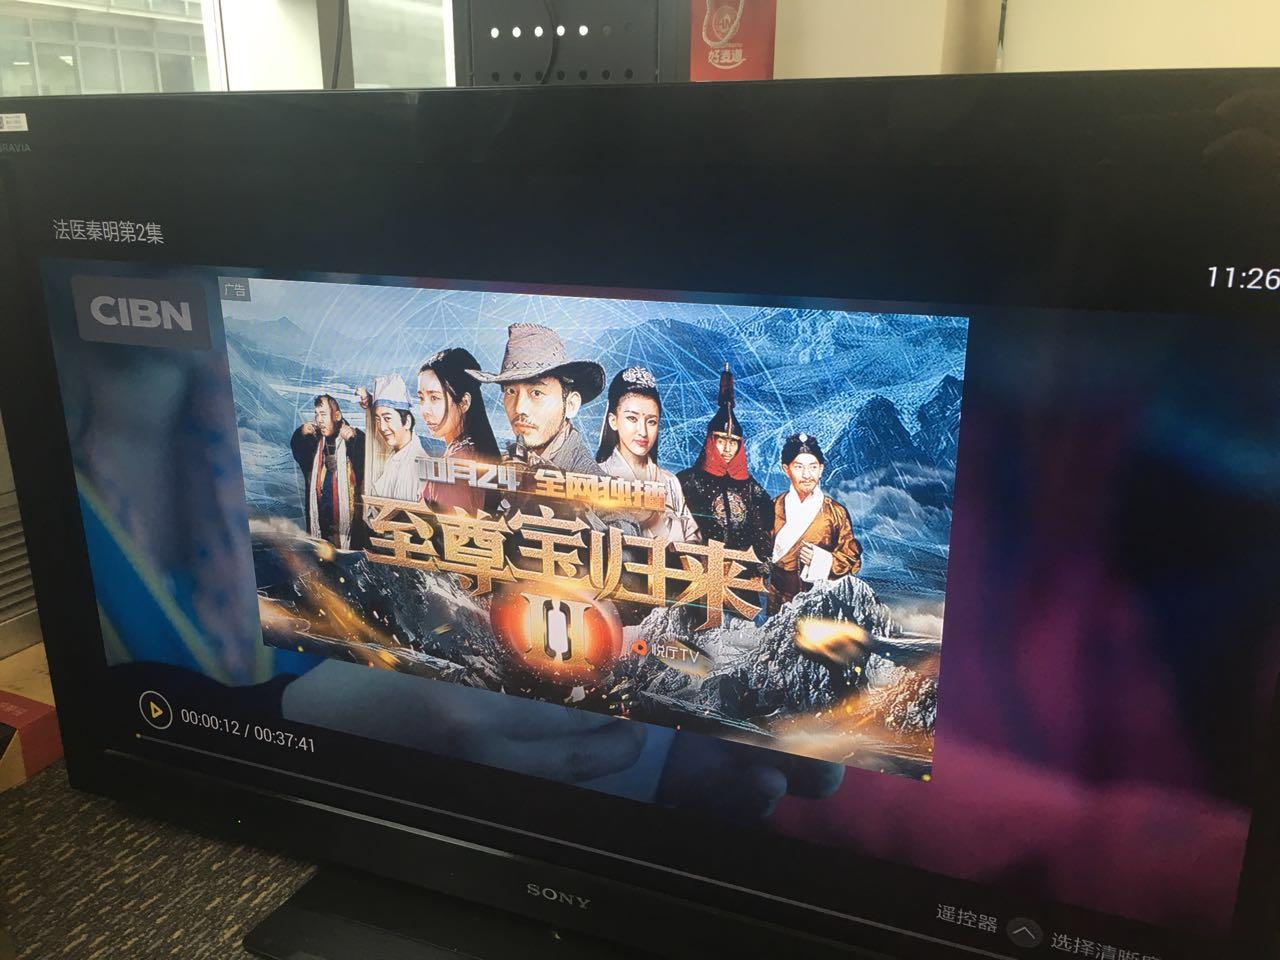 TV端暂停页广告(热剧《法医秦明》)